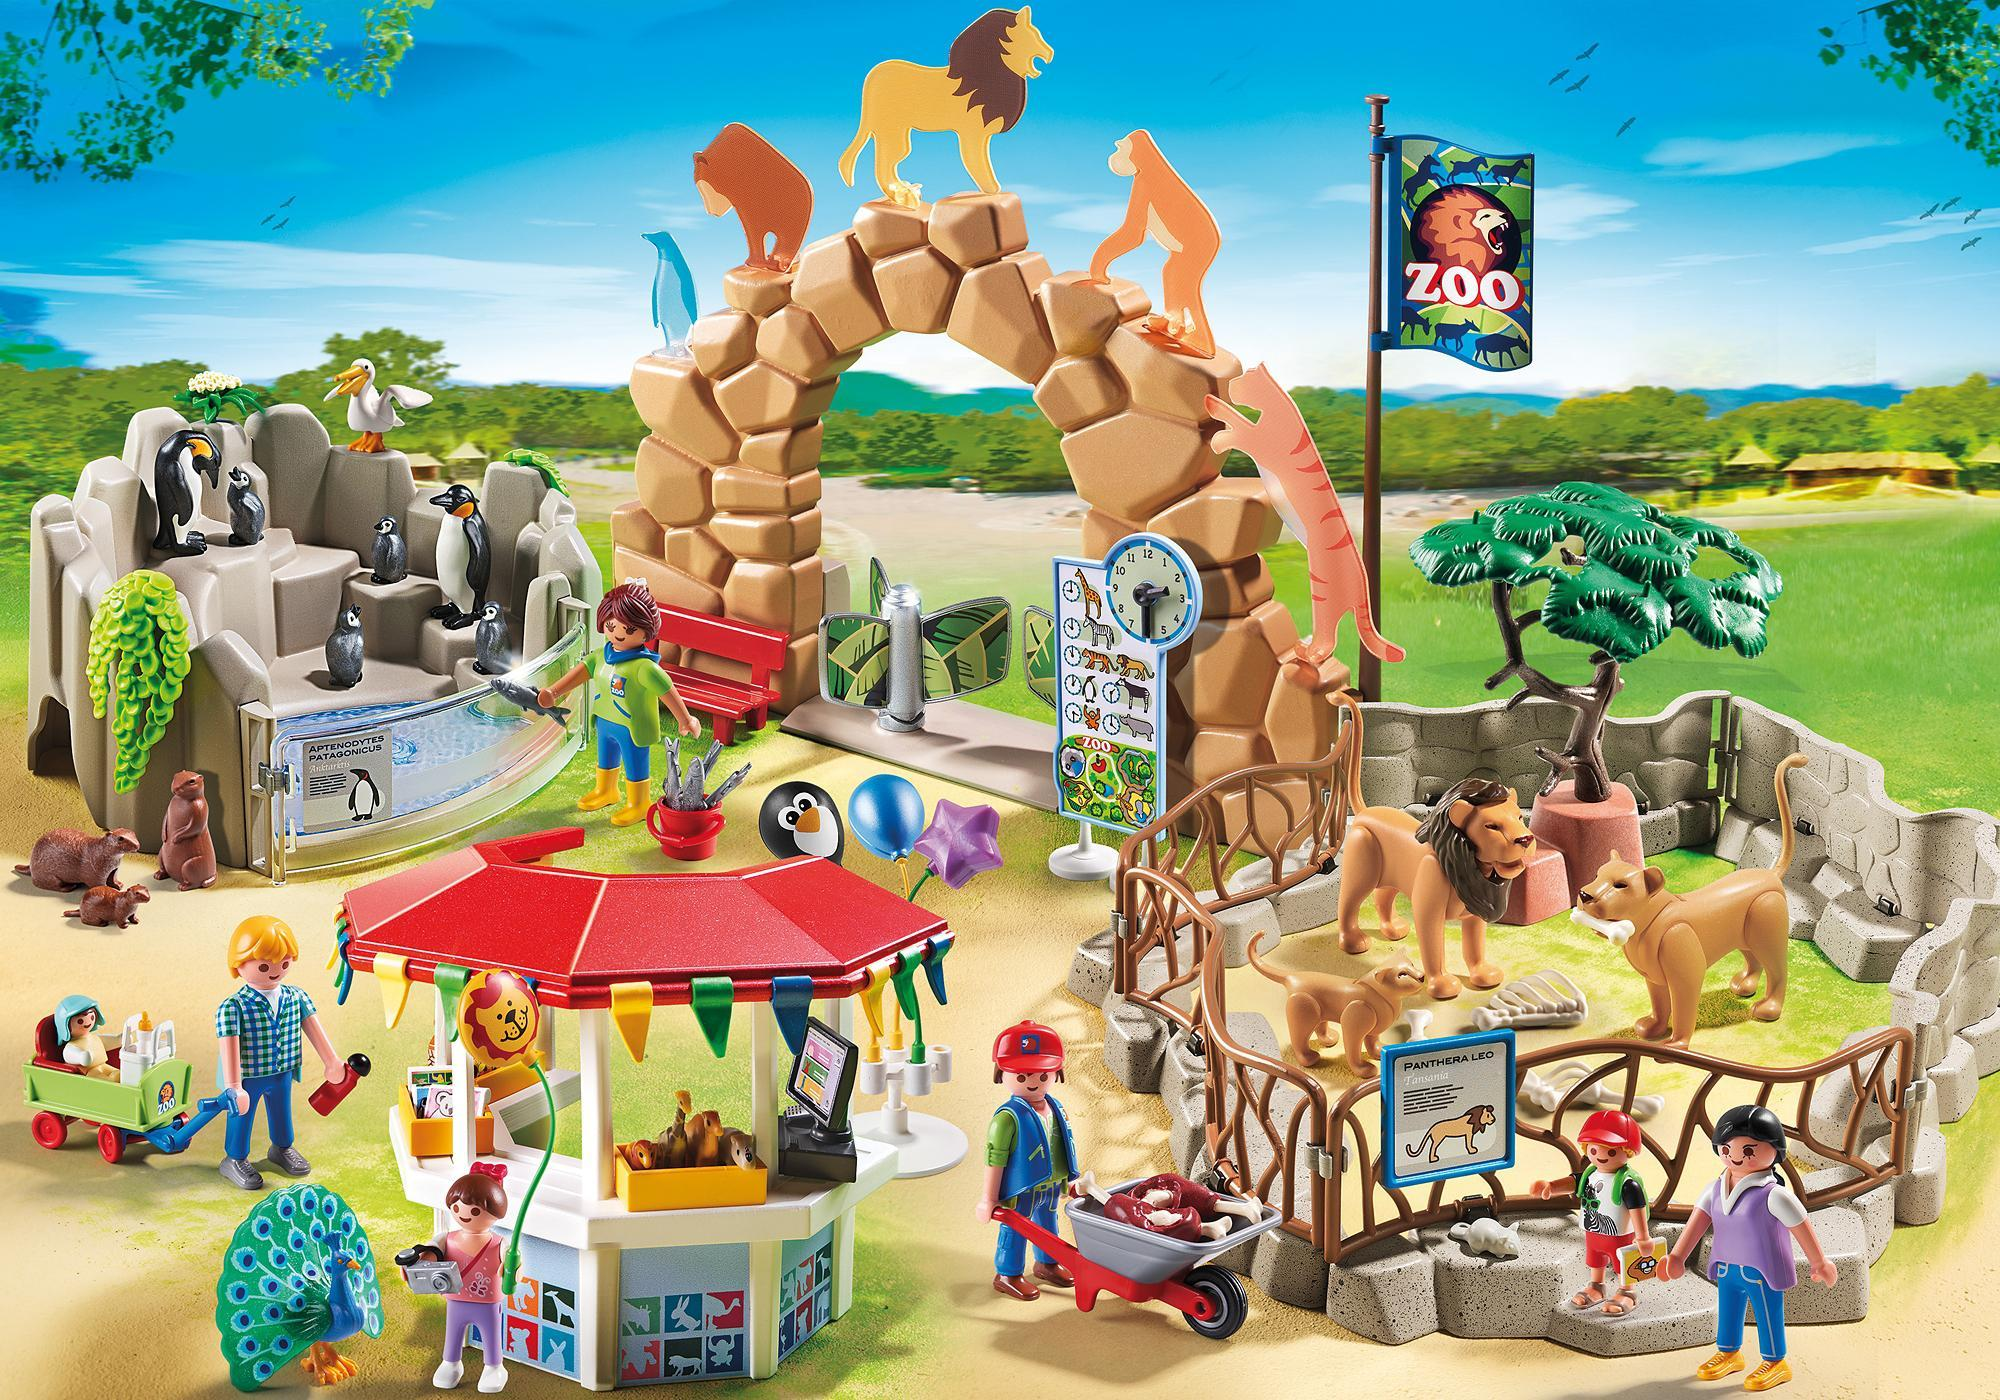 http://media.playmobil.com/i/playmobil/6634_product_detail/Large City Zoo